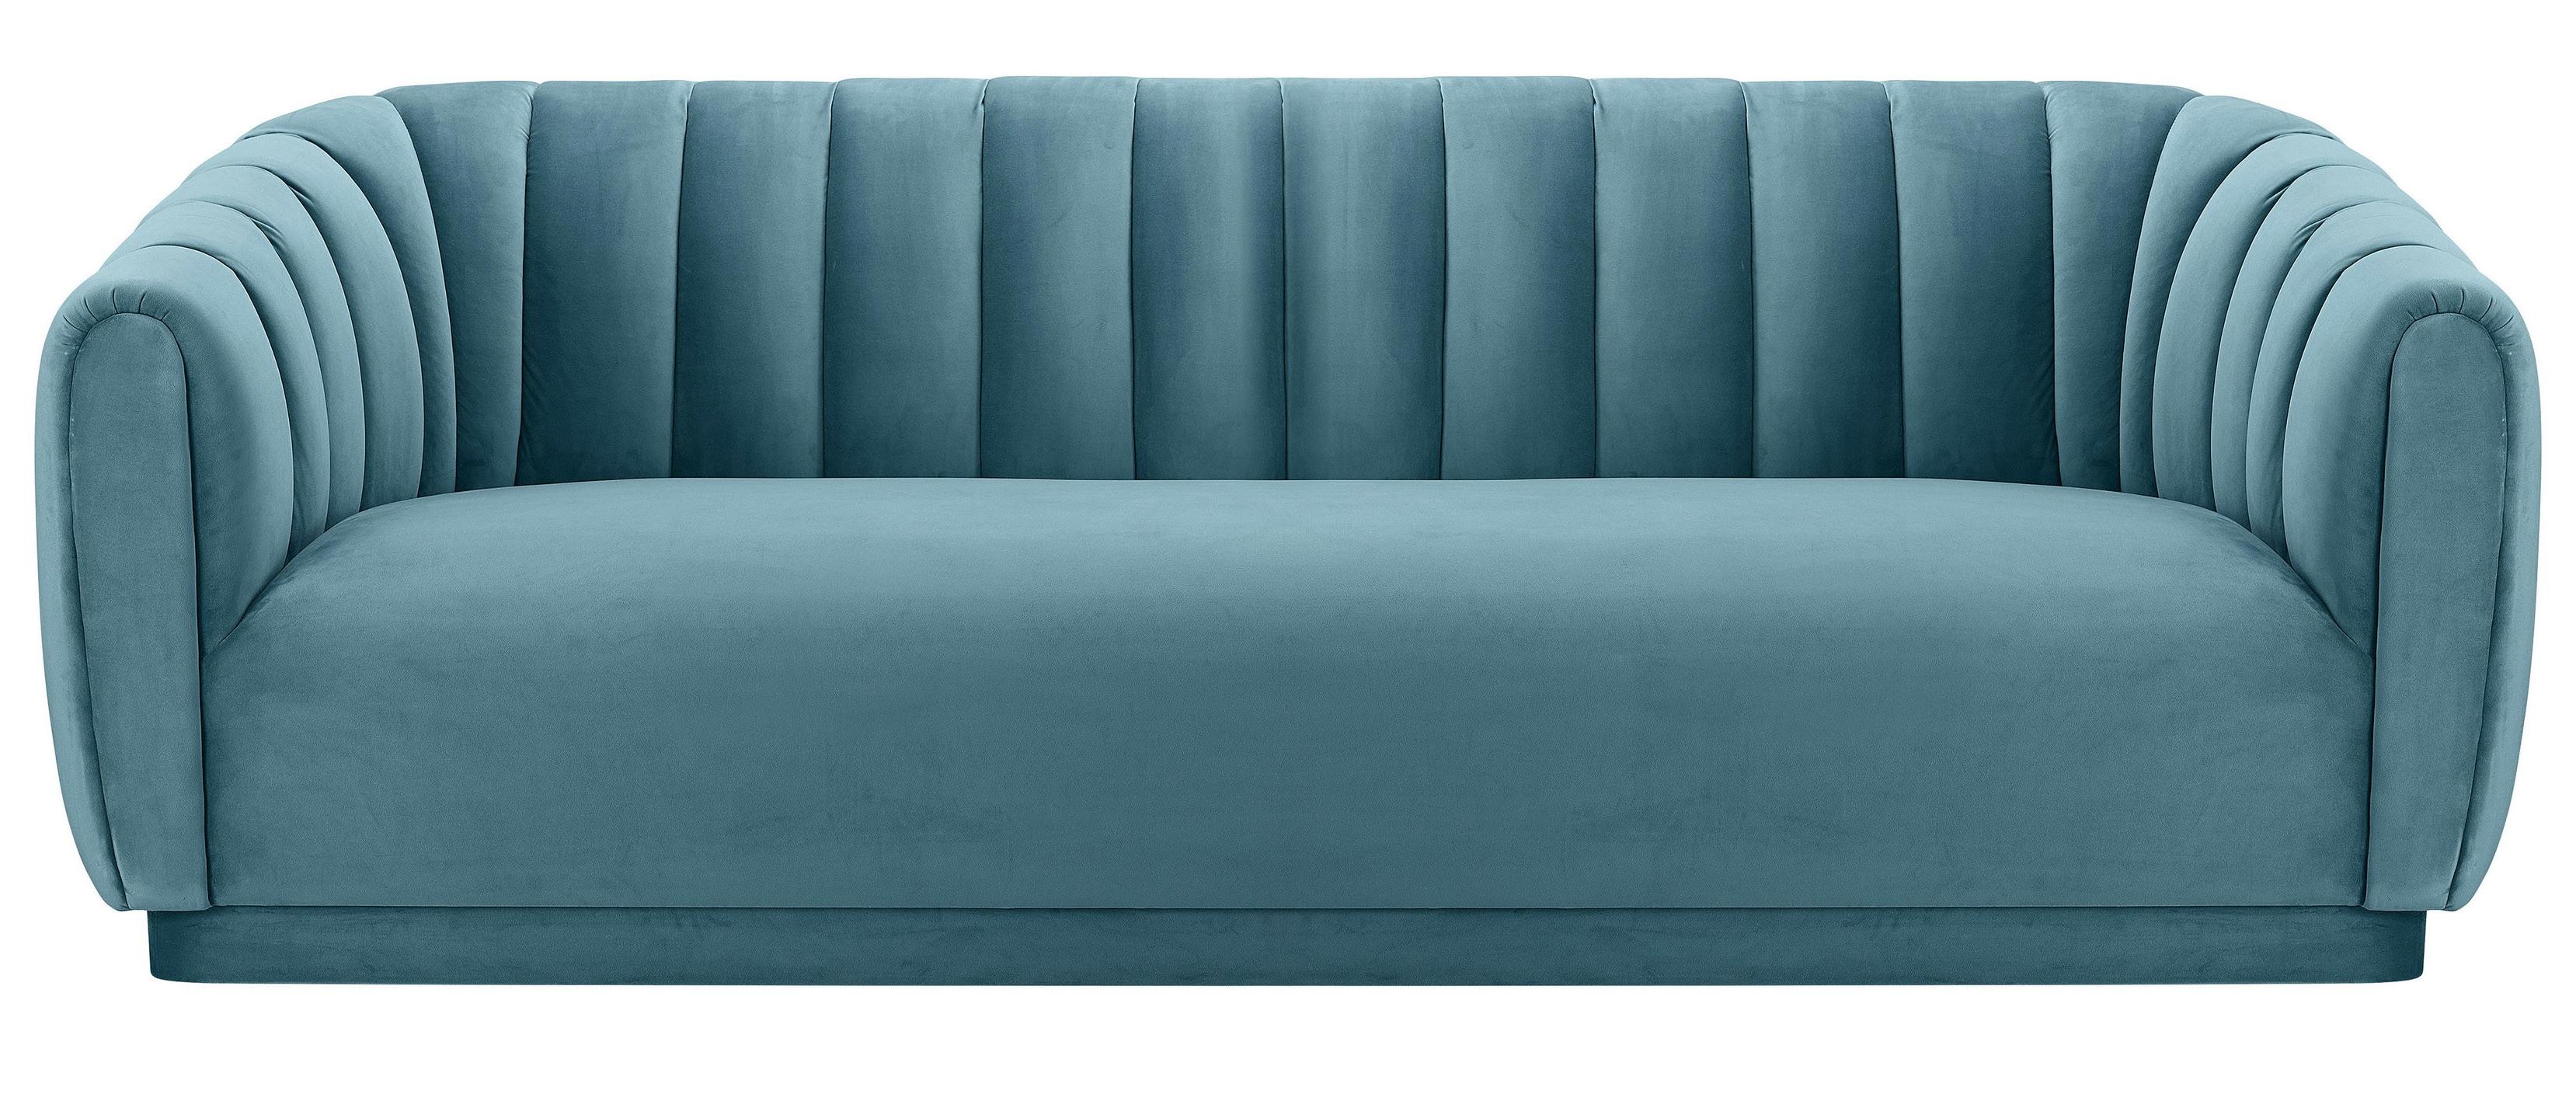 Widely Used Marissa Sofa Chairs Regarding Marissa Velvet Sofa, Sea Blue (View 20 of 20)